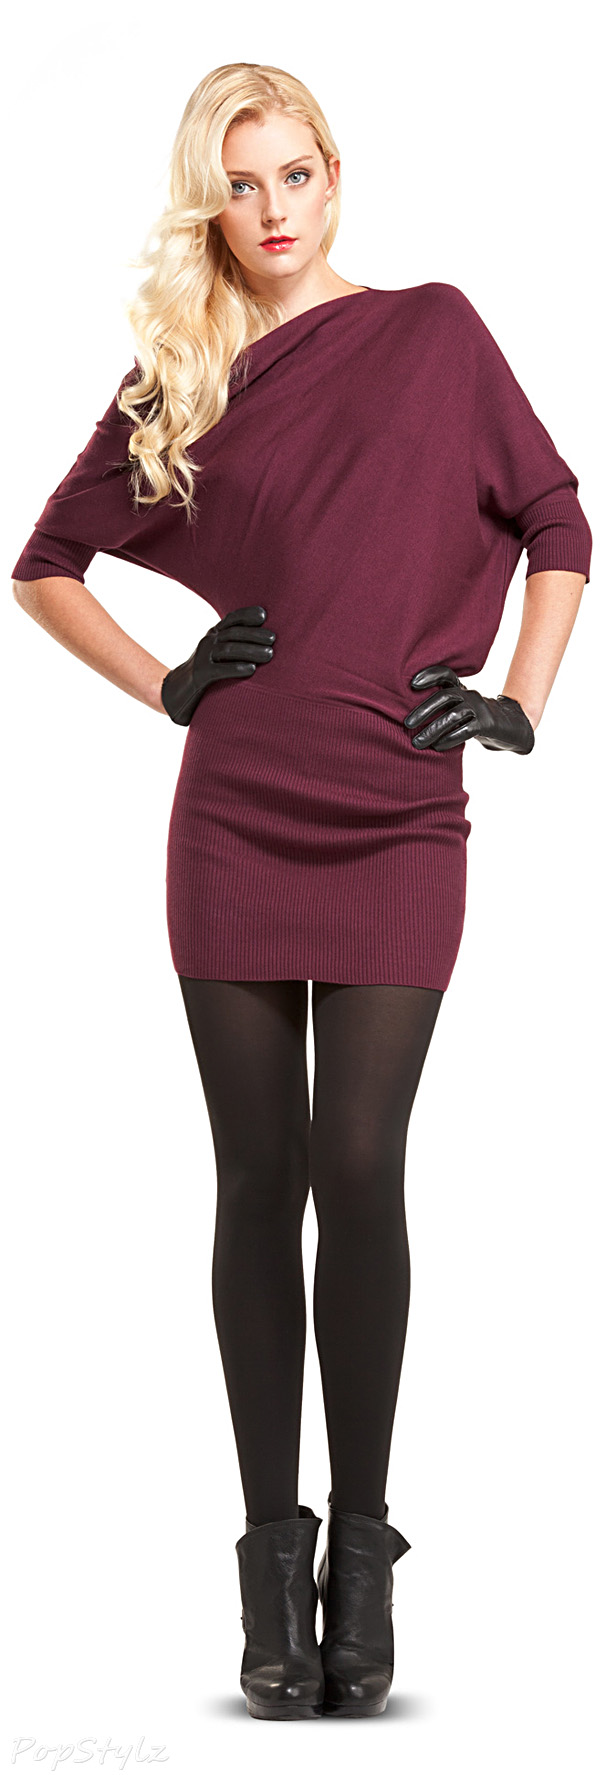 MAXSTUDIO Knitted Asymmetrical Sweater Dress